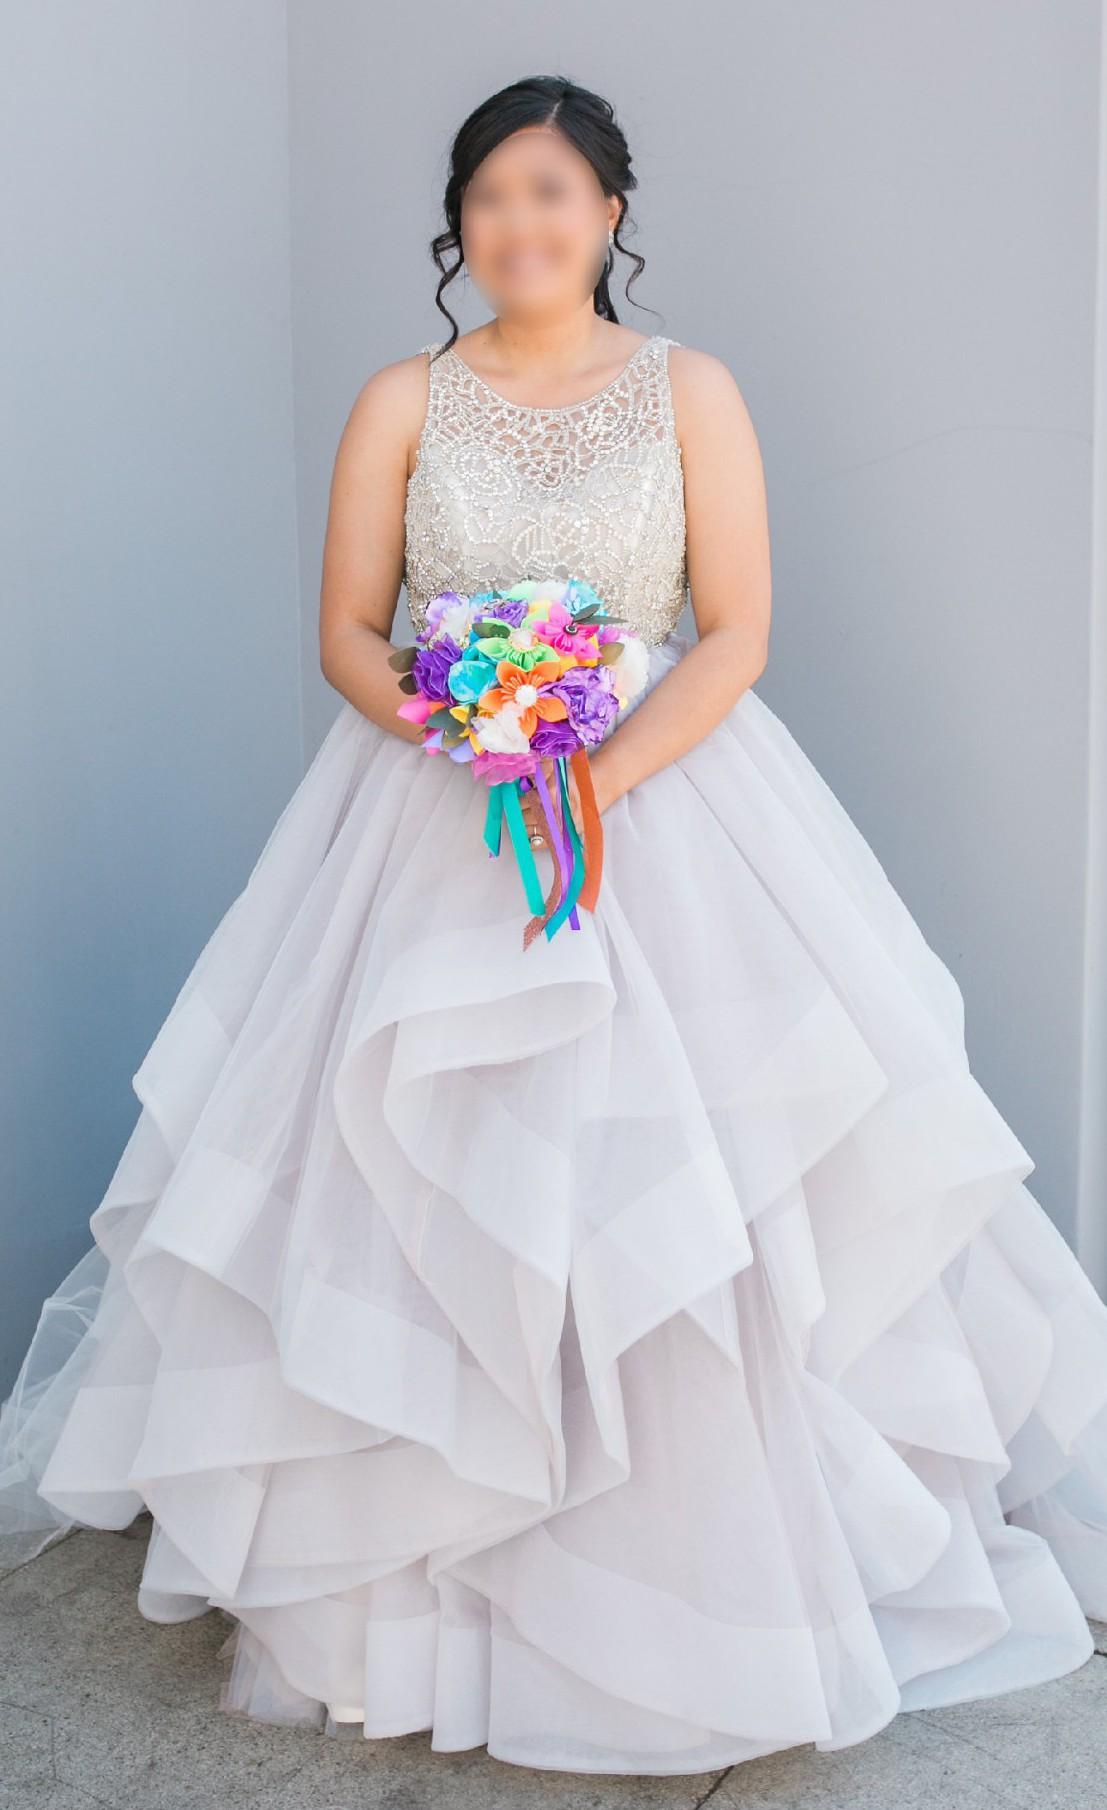 Hayley Paige Dori / Style 6413 - Used Wedding Dresses - Stillwhite